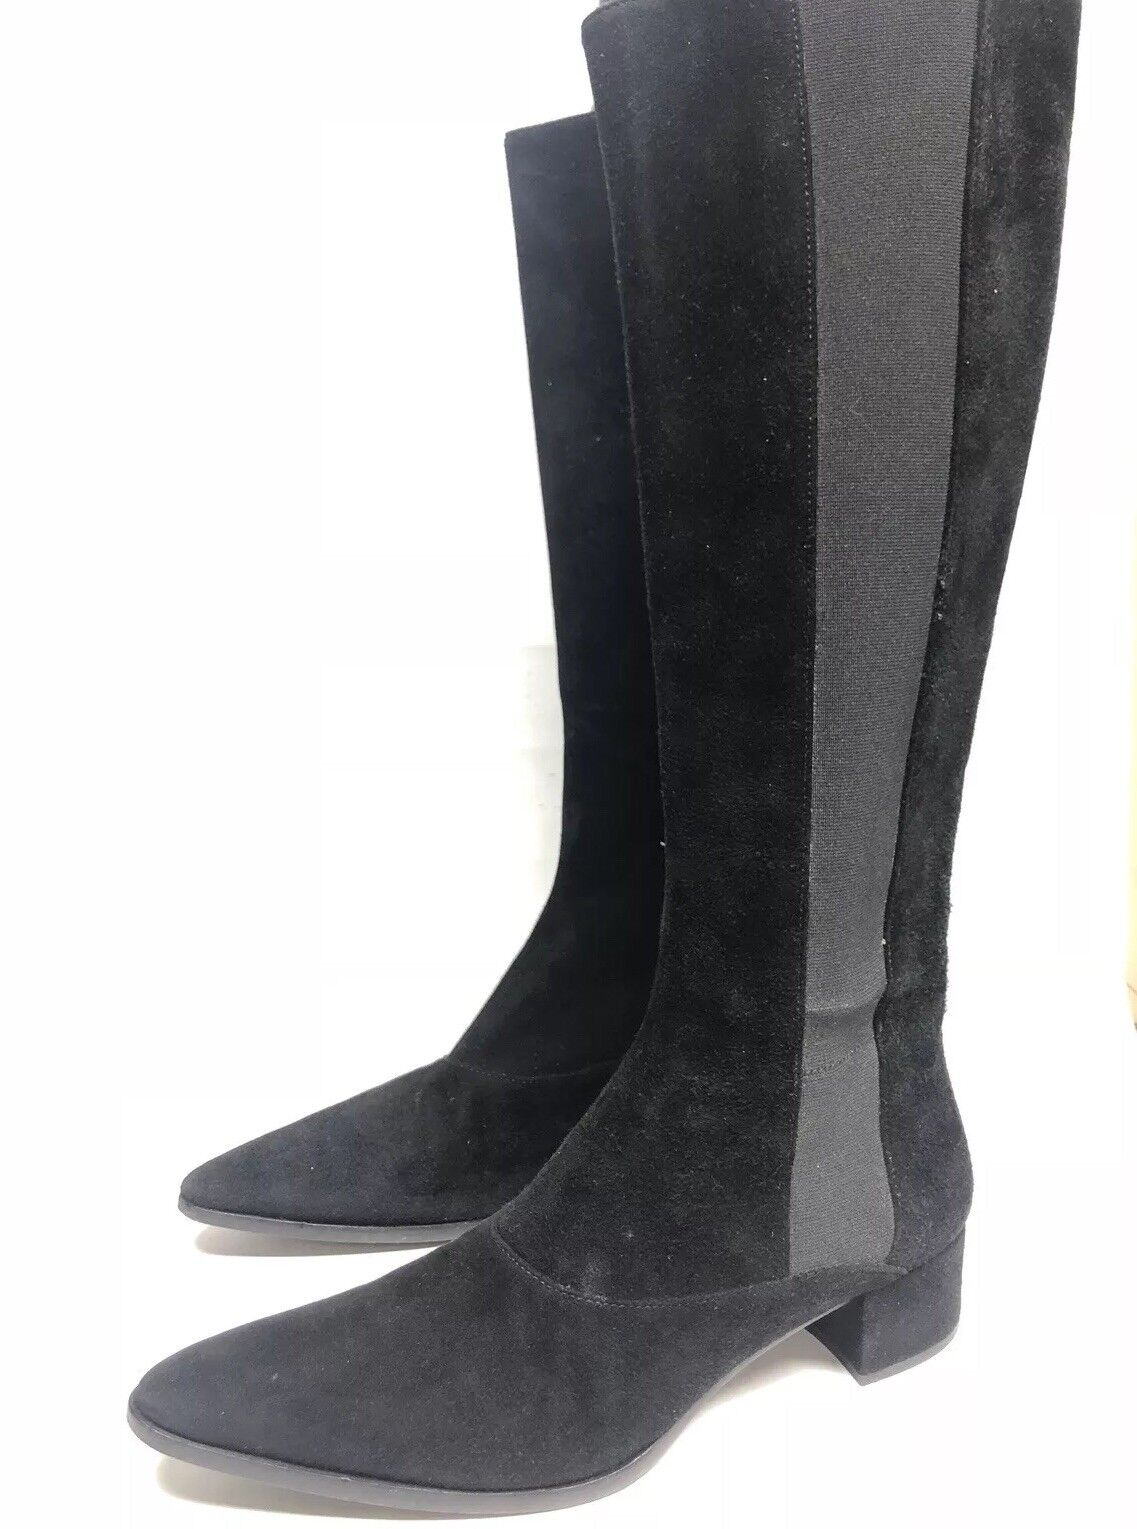 Prada Black Suede Boots 37.5